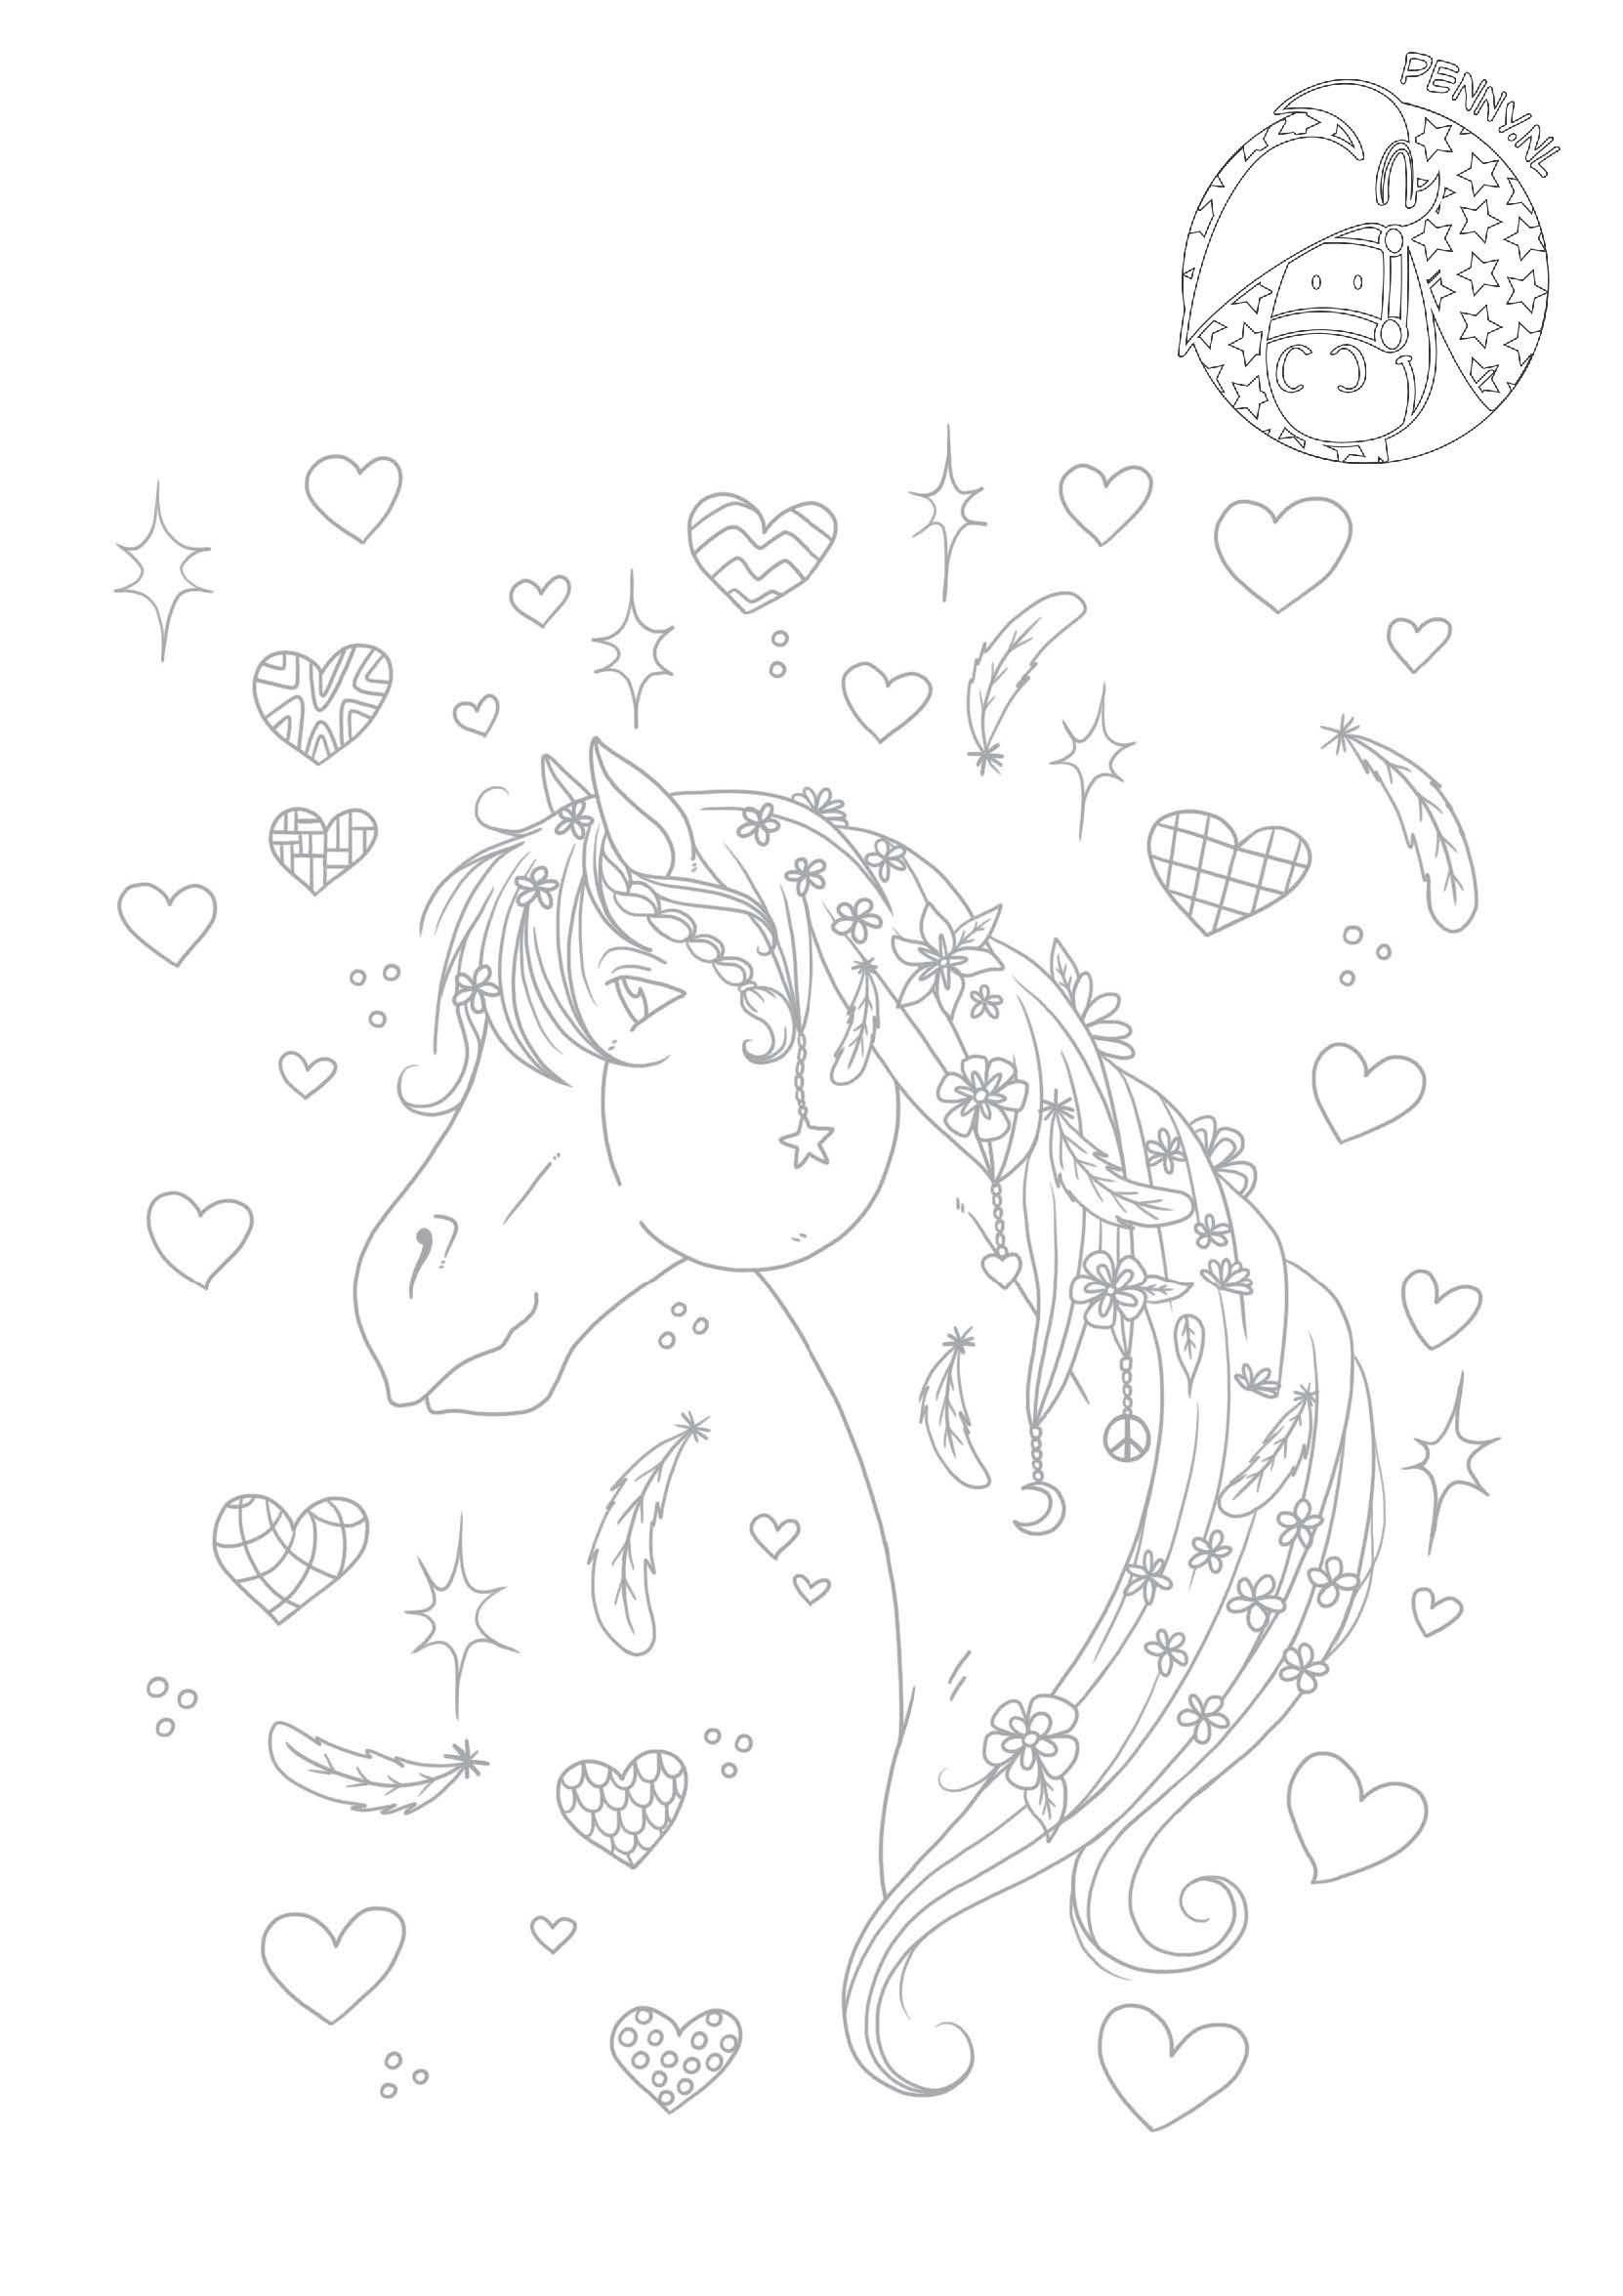 Sneeuw Kleurplaat Mooi Paard Met Versiering Penny